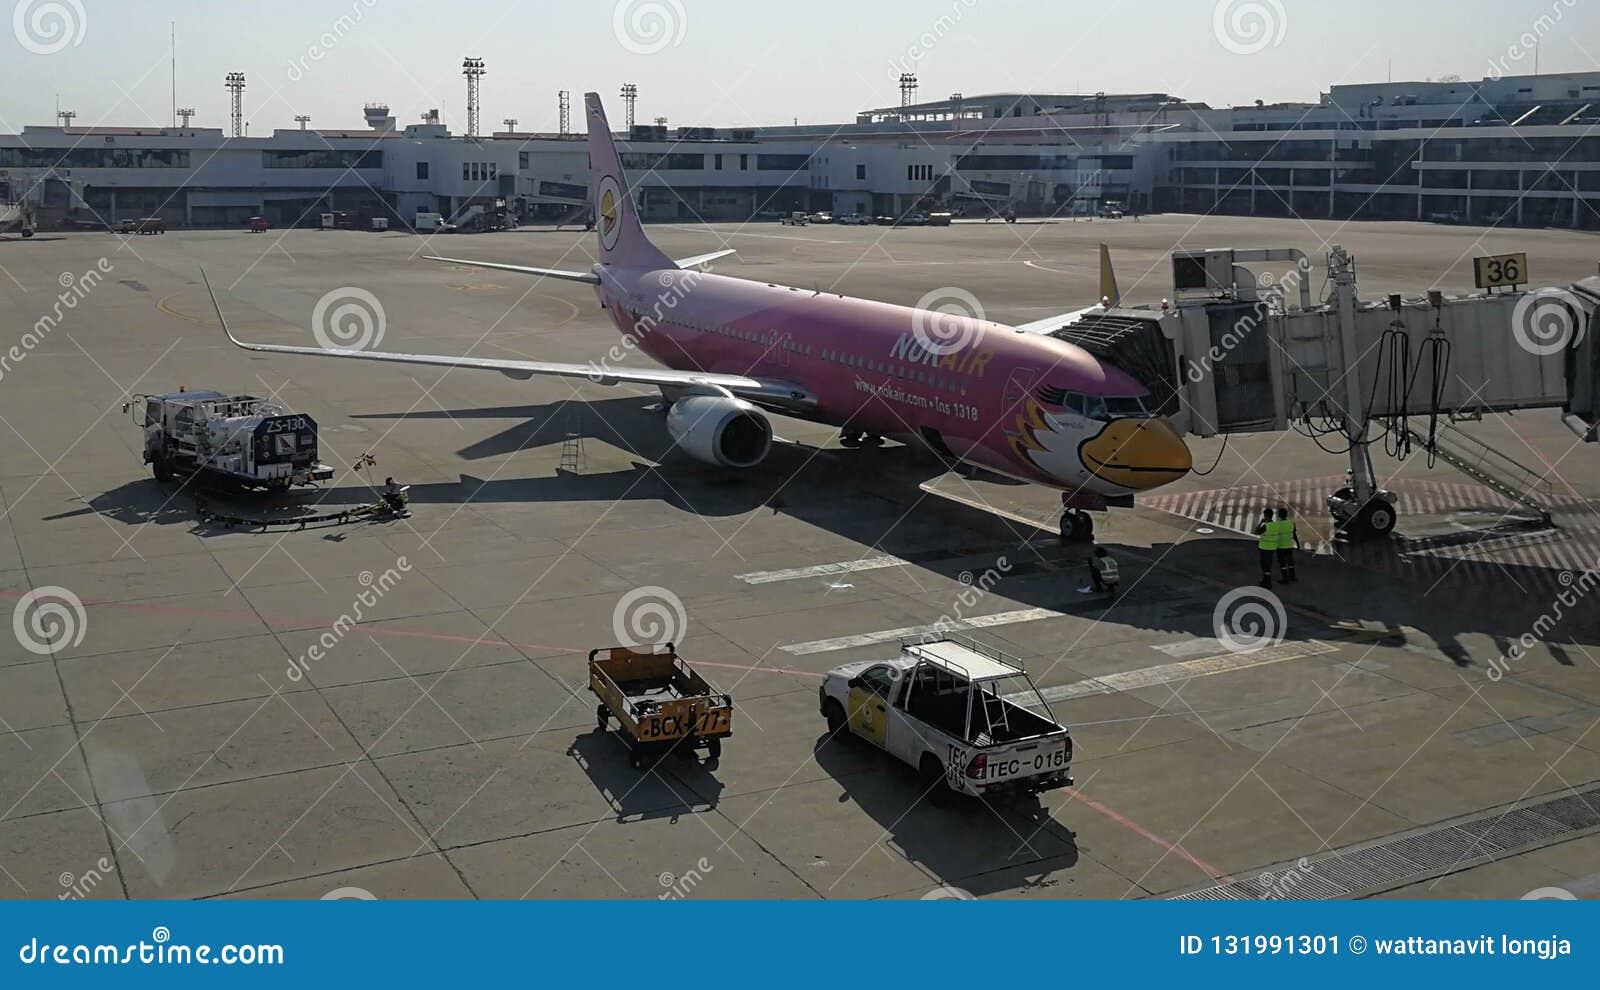 Nokair på porten i Don Maung Internationnal Airport, Thailand